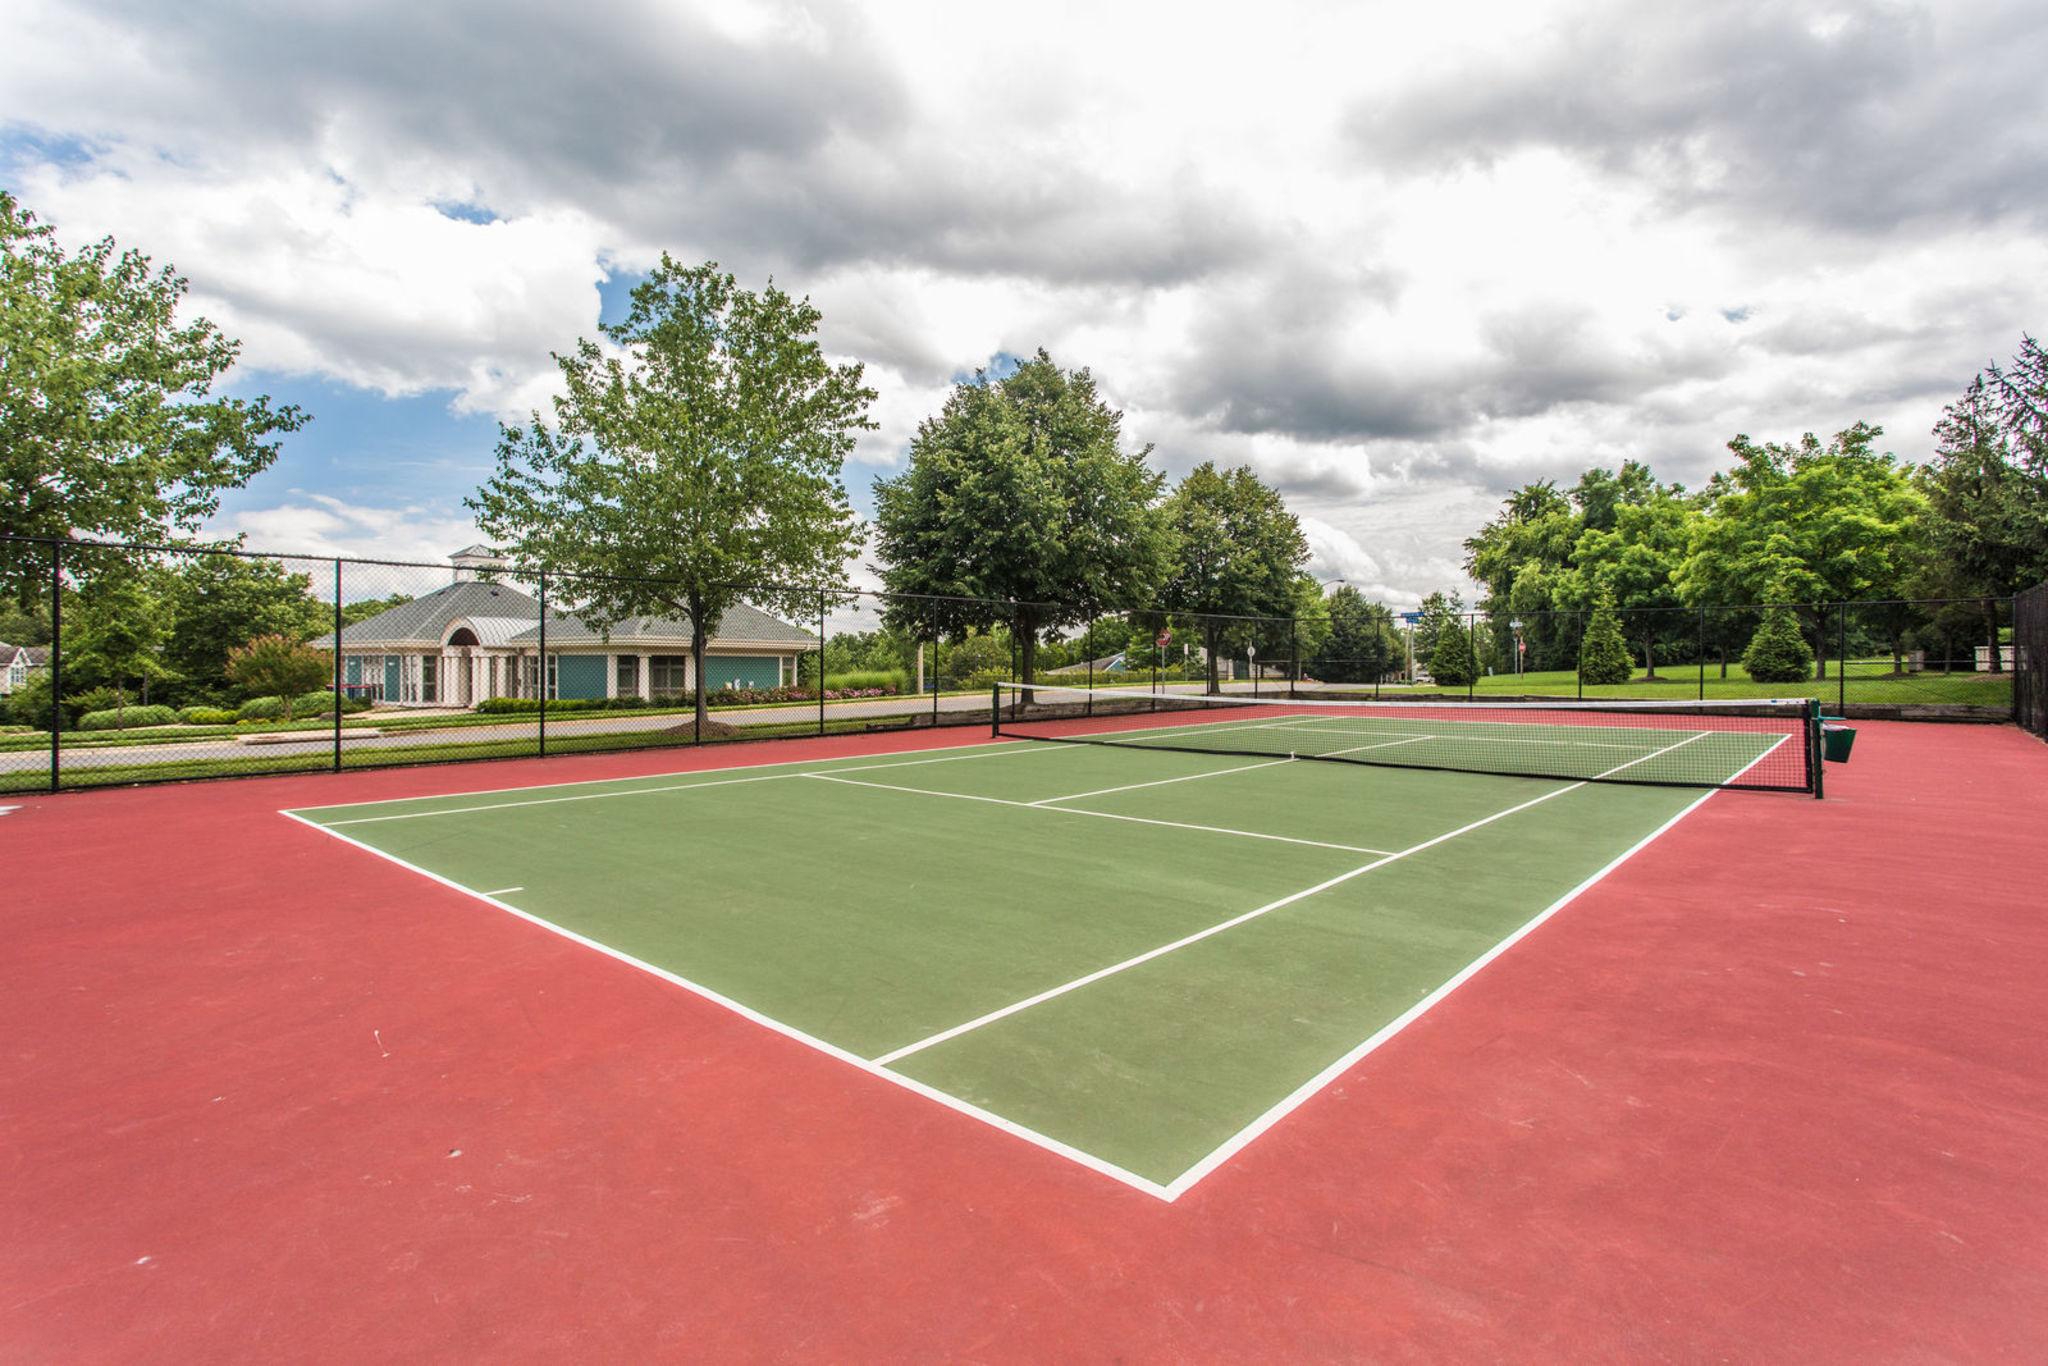 14340_stonewater_ct-print-049-32-tennis_court-4200x2800-300dpi.jpg